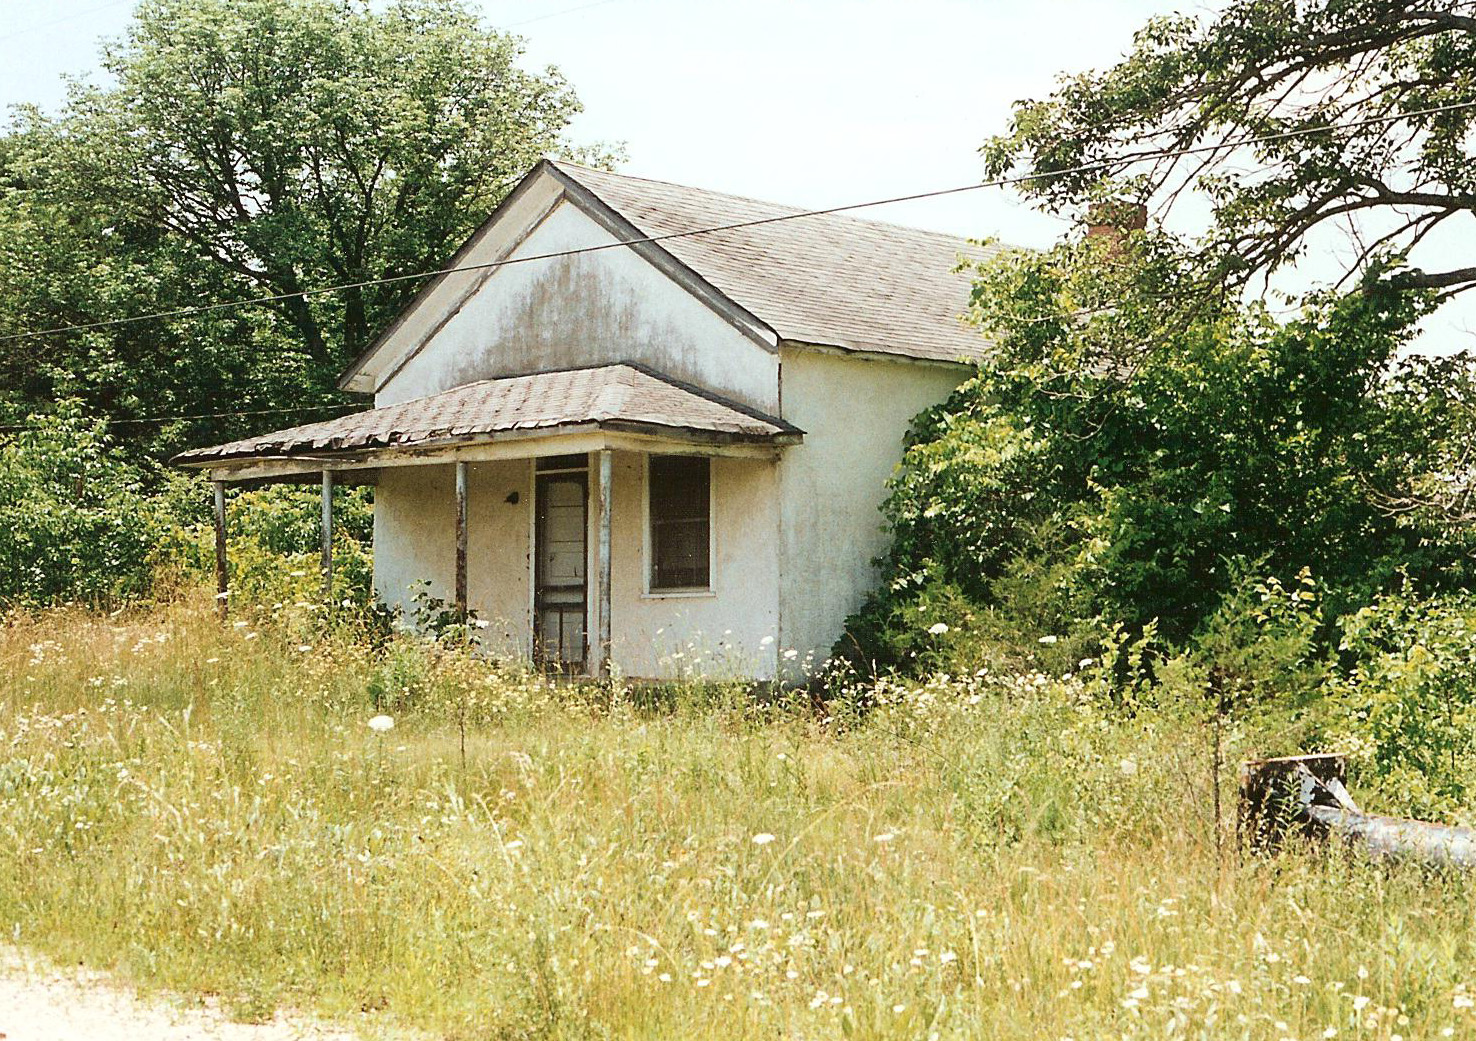 webster county missouri, MO, Marlin School near Marlin Cemetery, Marlin School